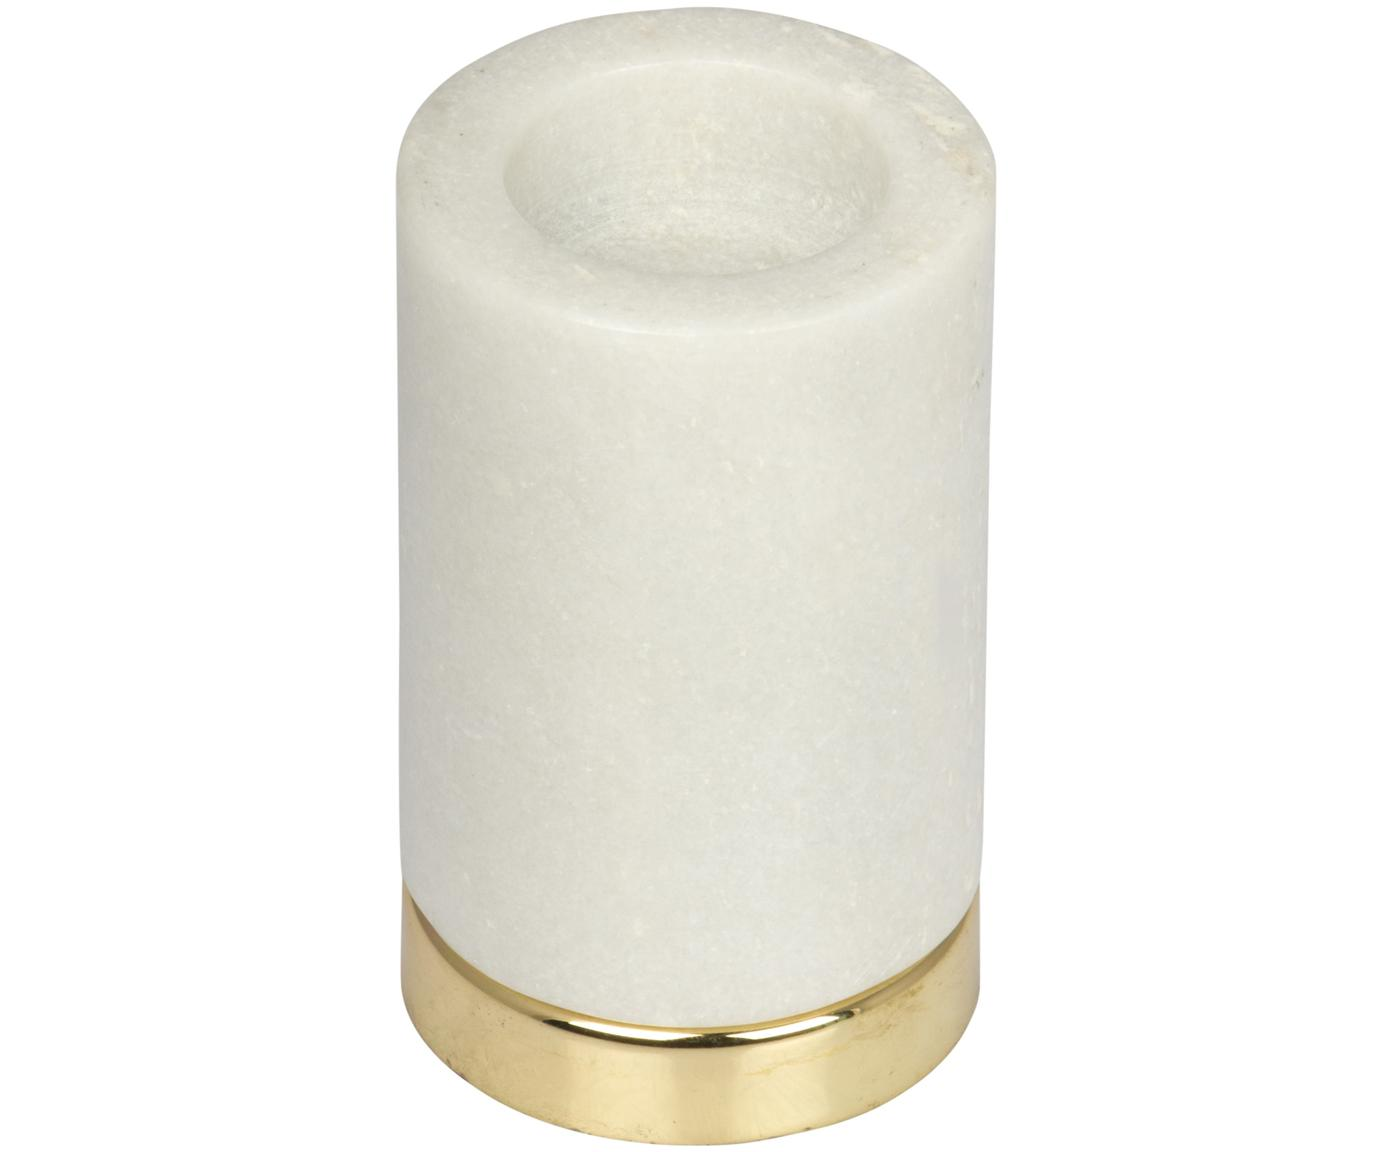 Portavelas Porter, Candelabro: mármol, Blanco, latón, Ø 7 x Al 11 cm